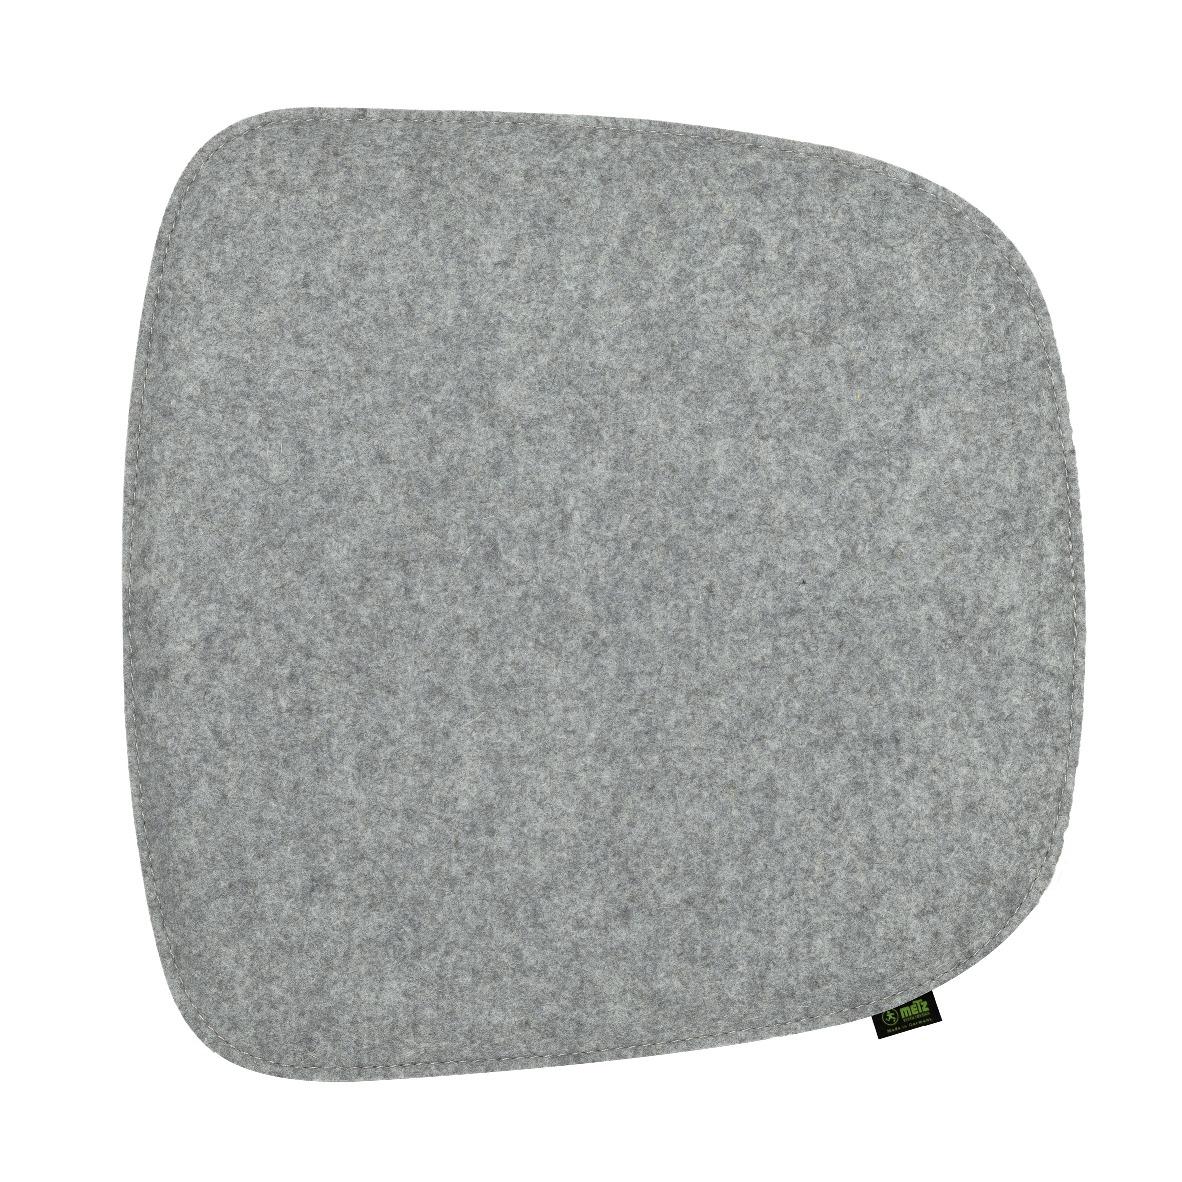 filz sitzkissen 2er set f r 39 39 eames arm chair 39 39 silbergrau. Black Bedroom Furniture Sets. Home Design Ideas